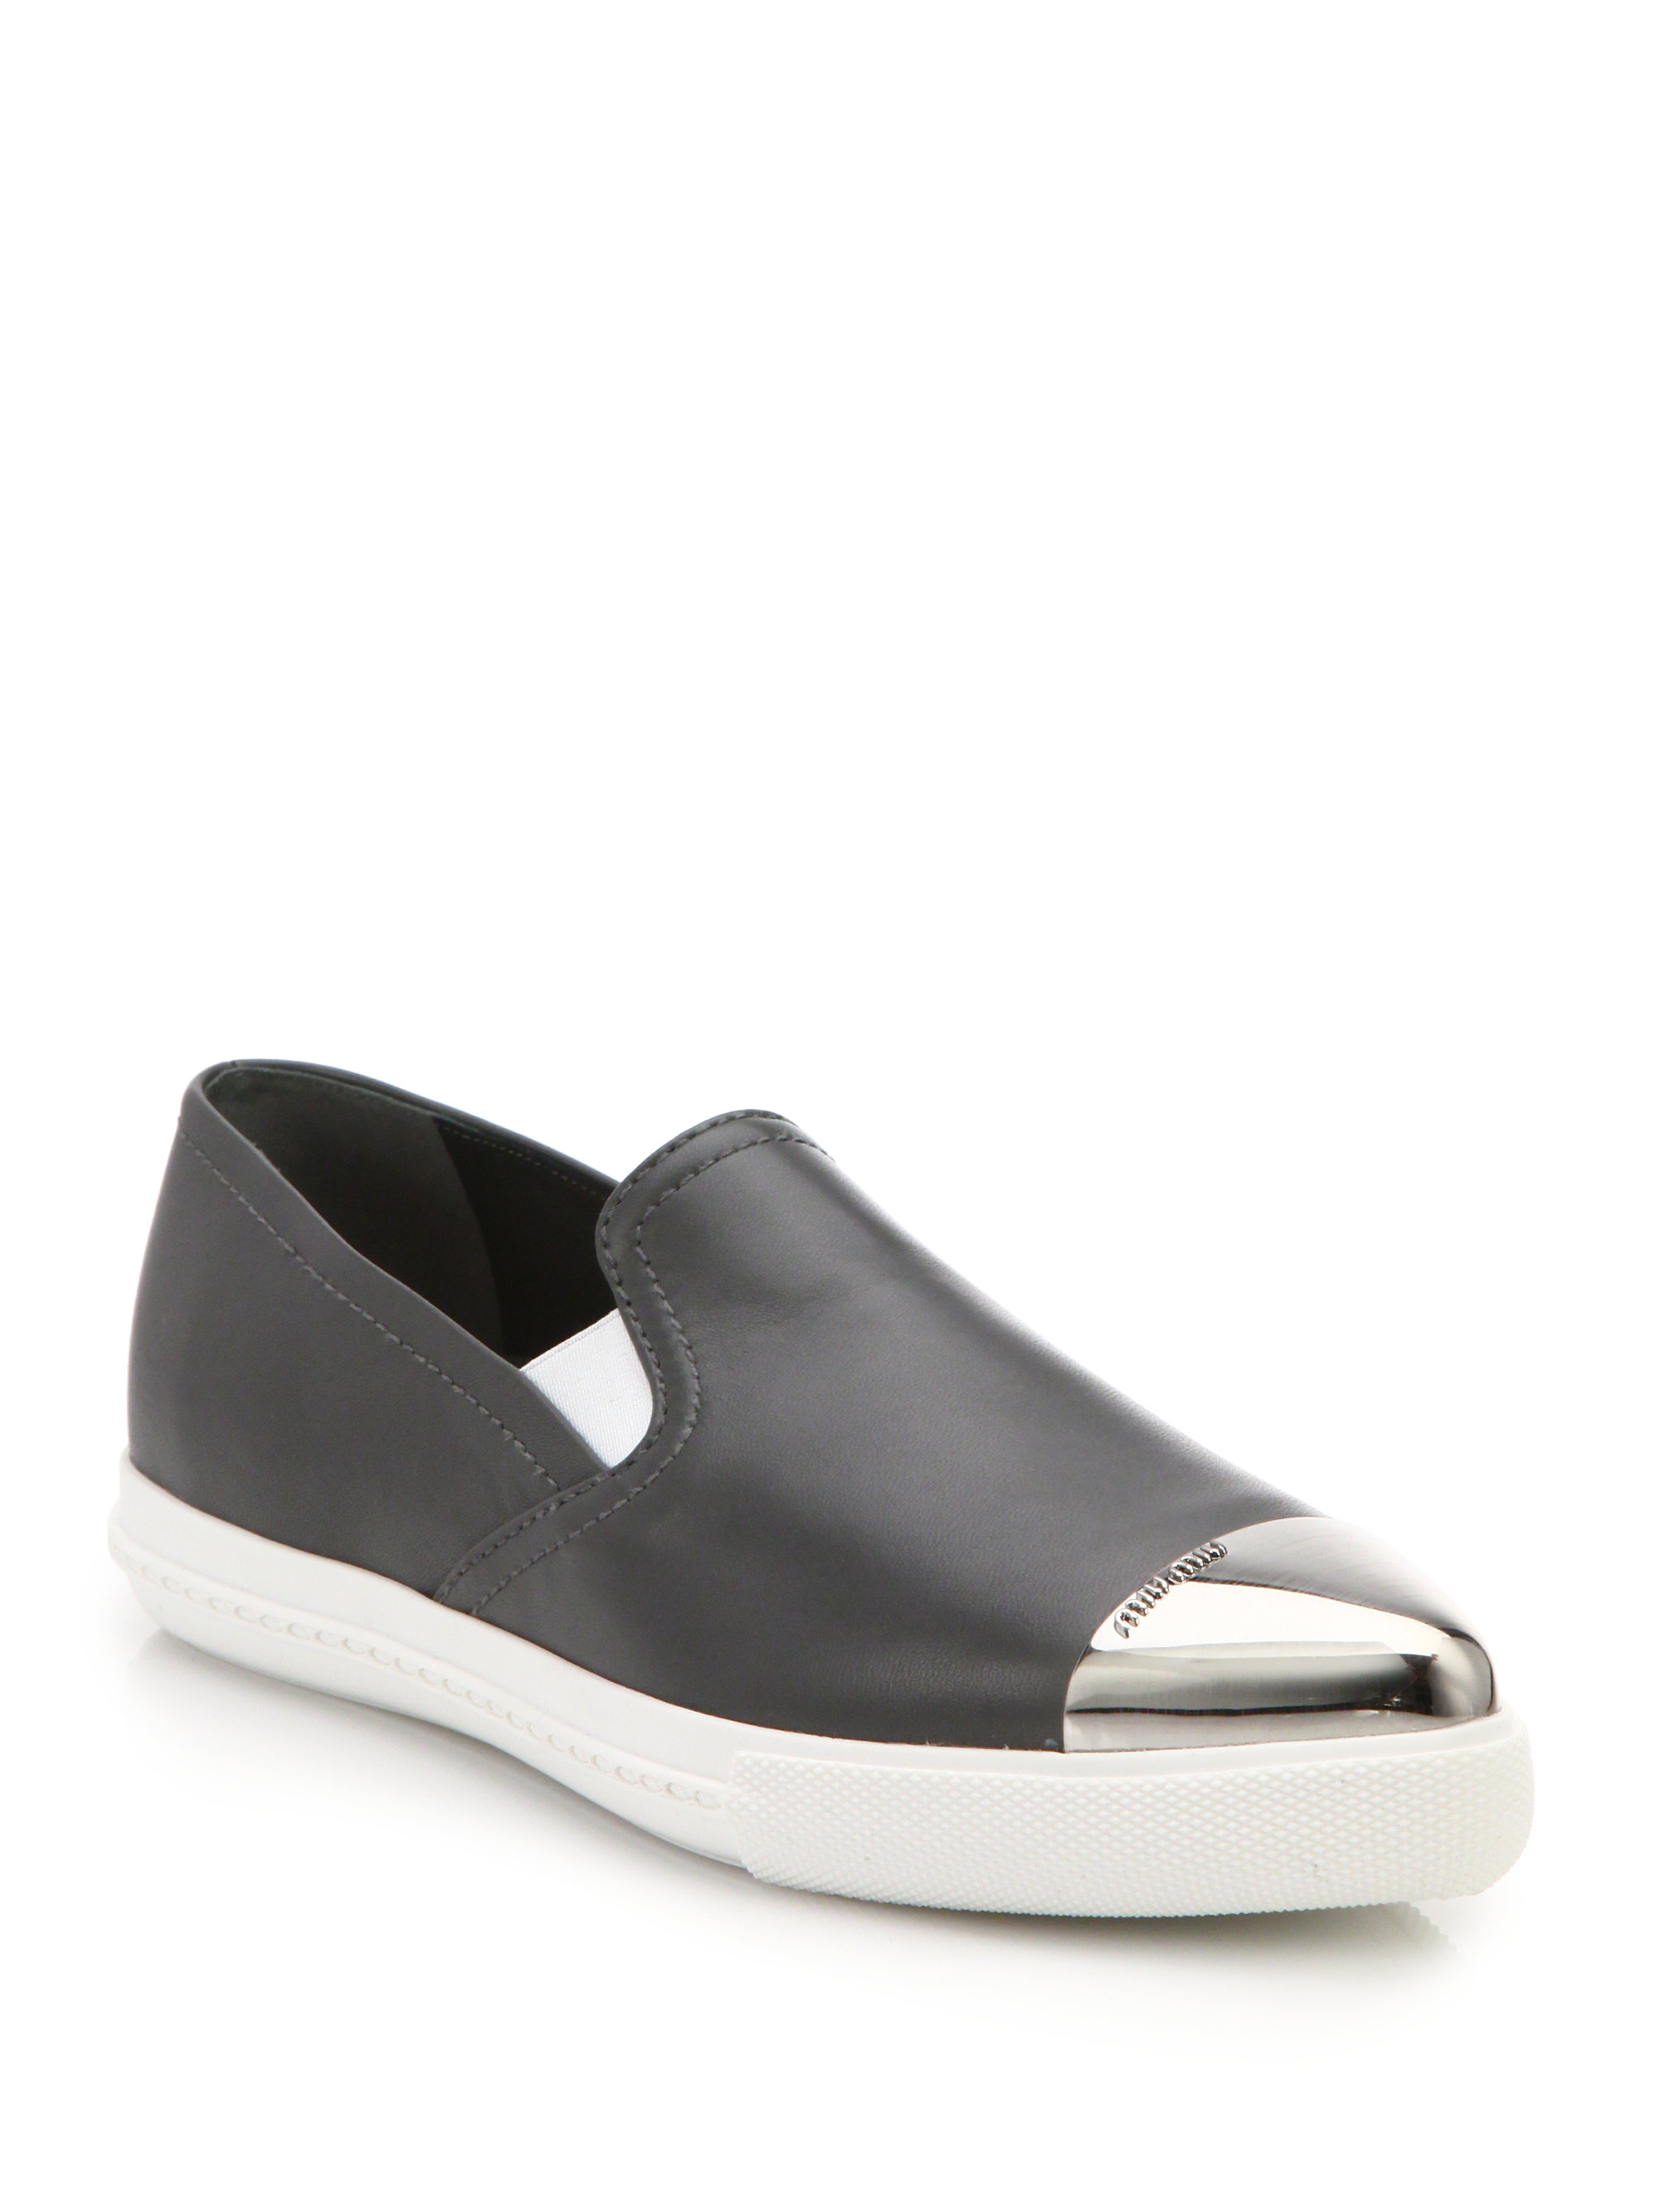 miu miu leather cap toe slip on sneakers in gray lyst. Black Bedroom Furniture Sets. Home Design Ideas